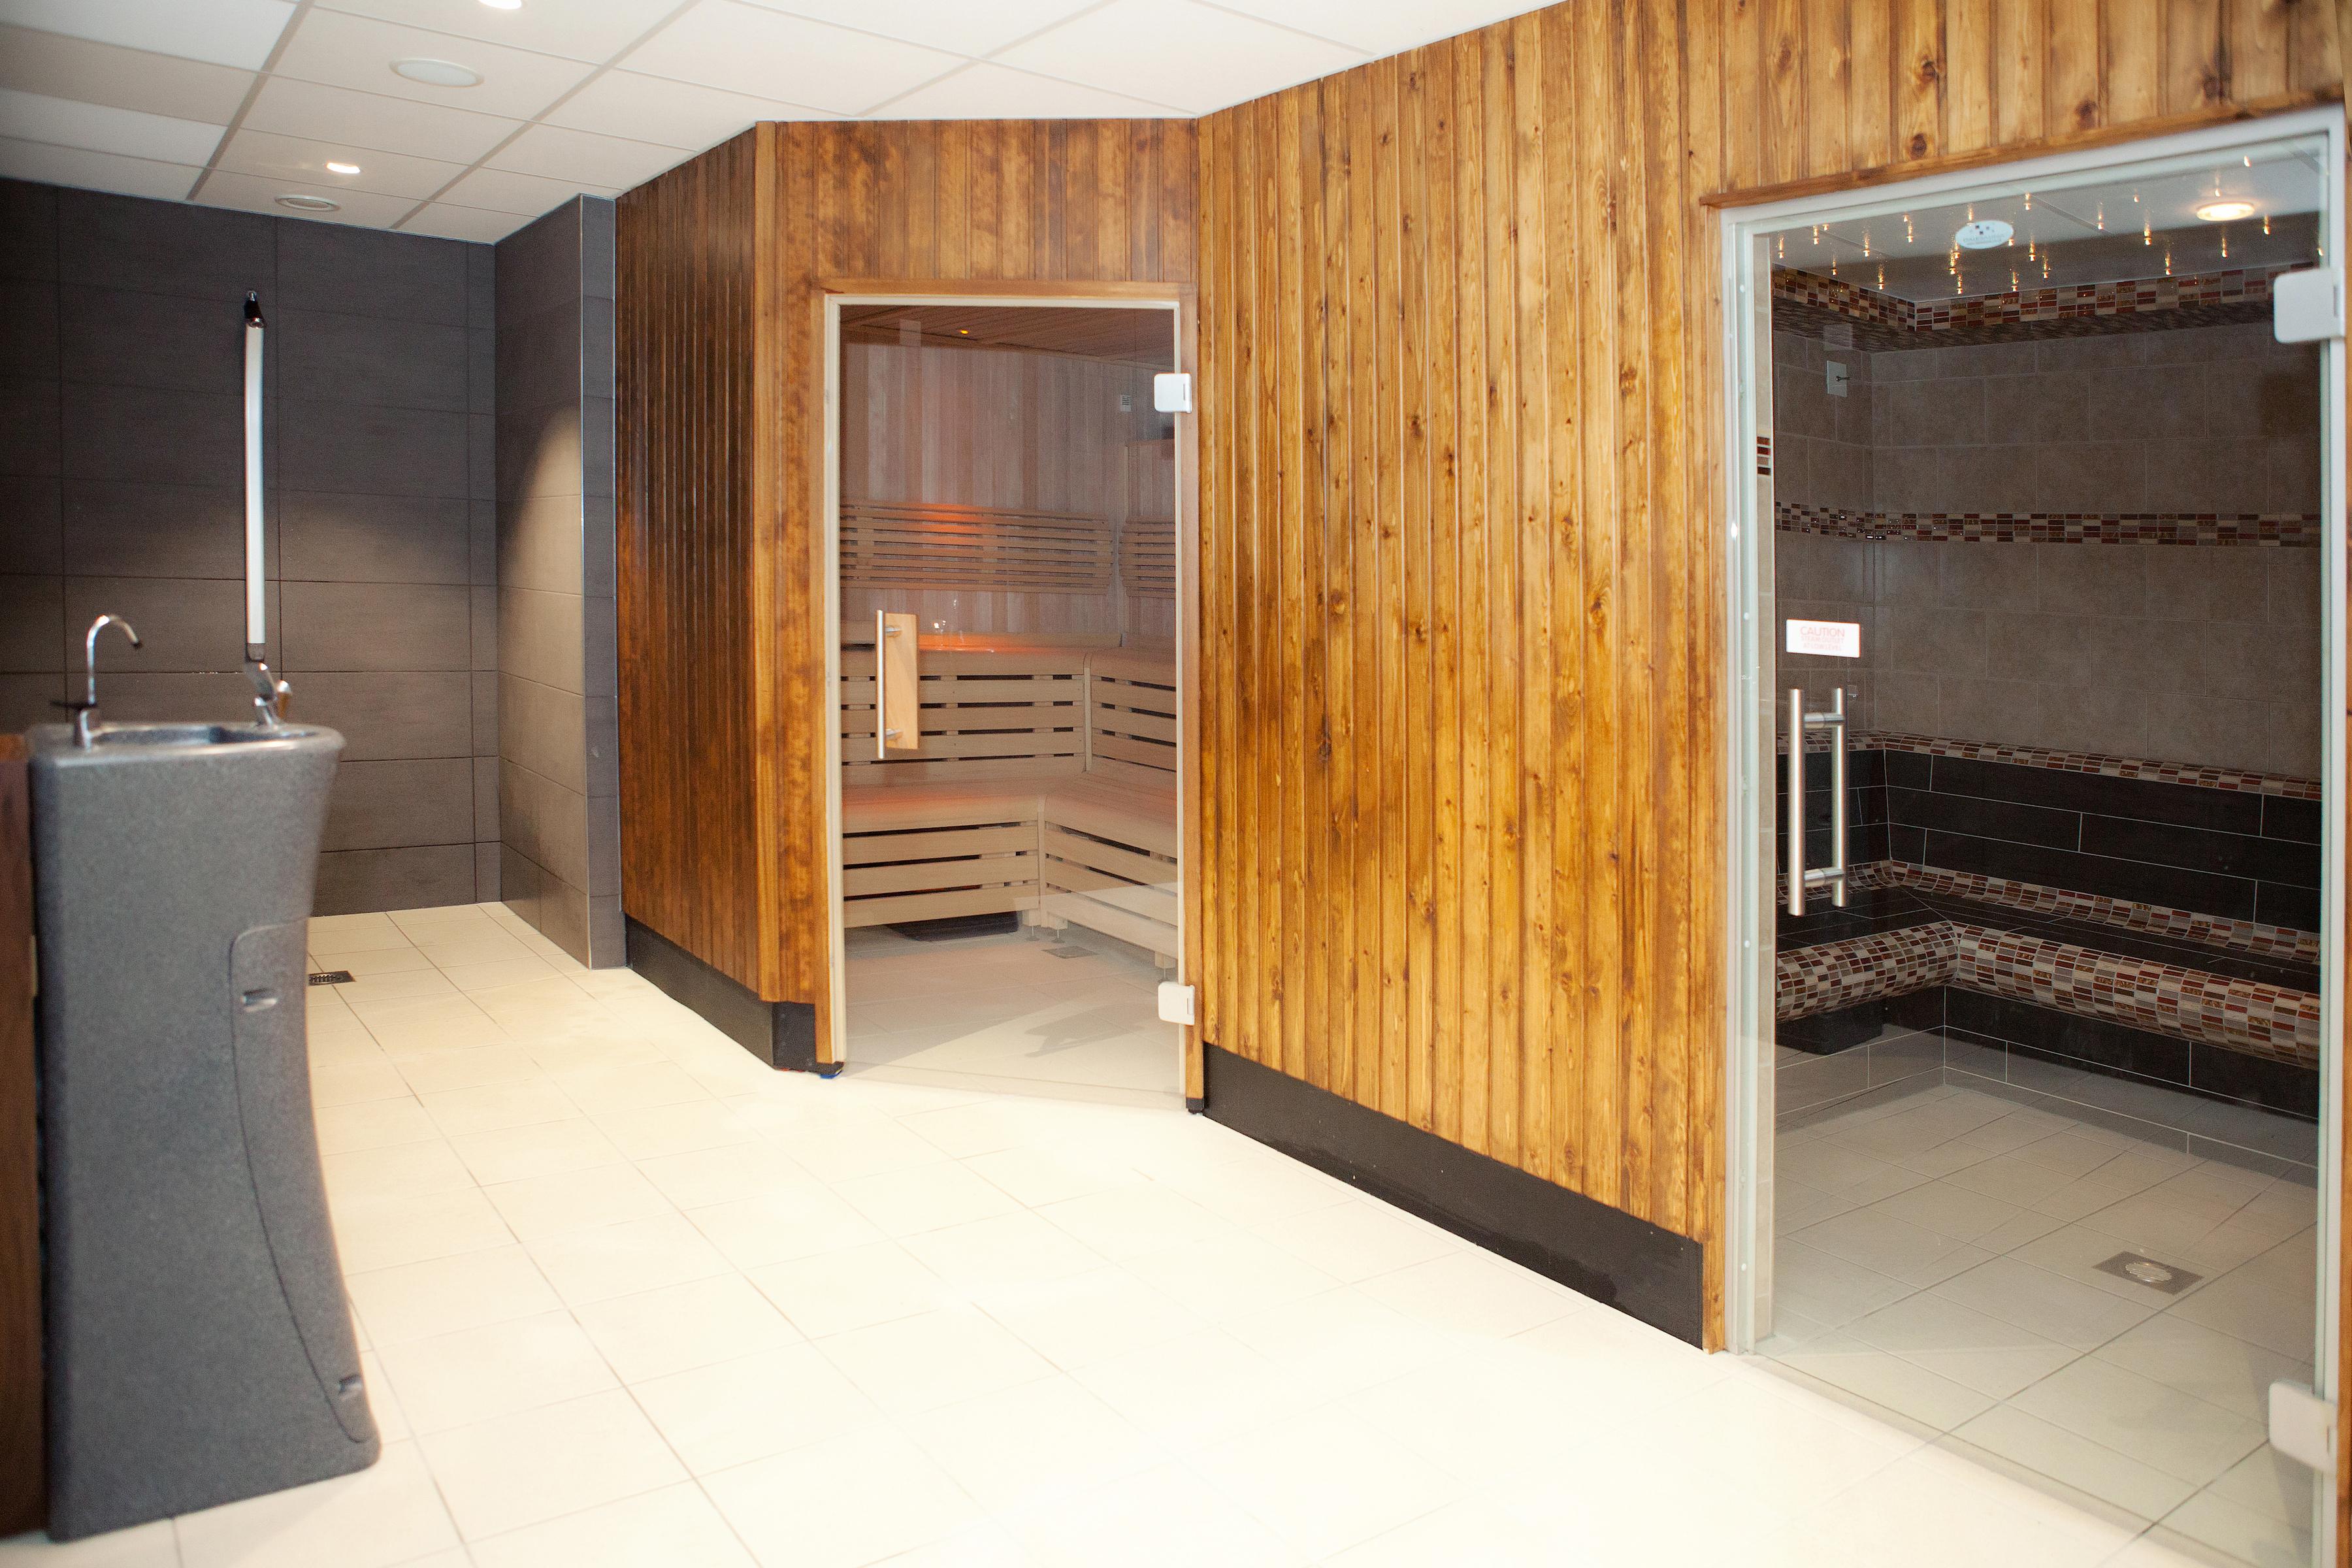 Lancing Manor Function Room